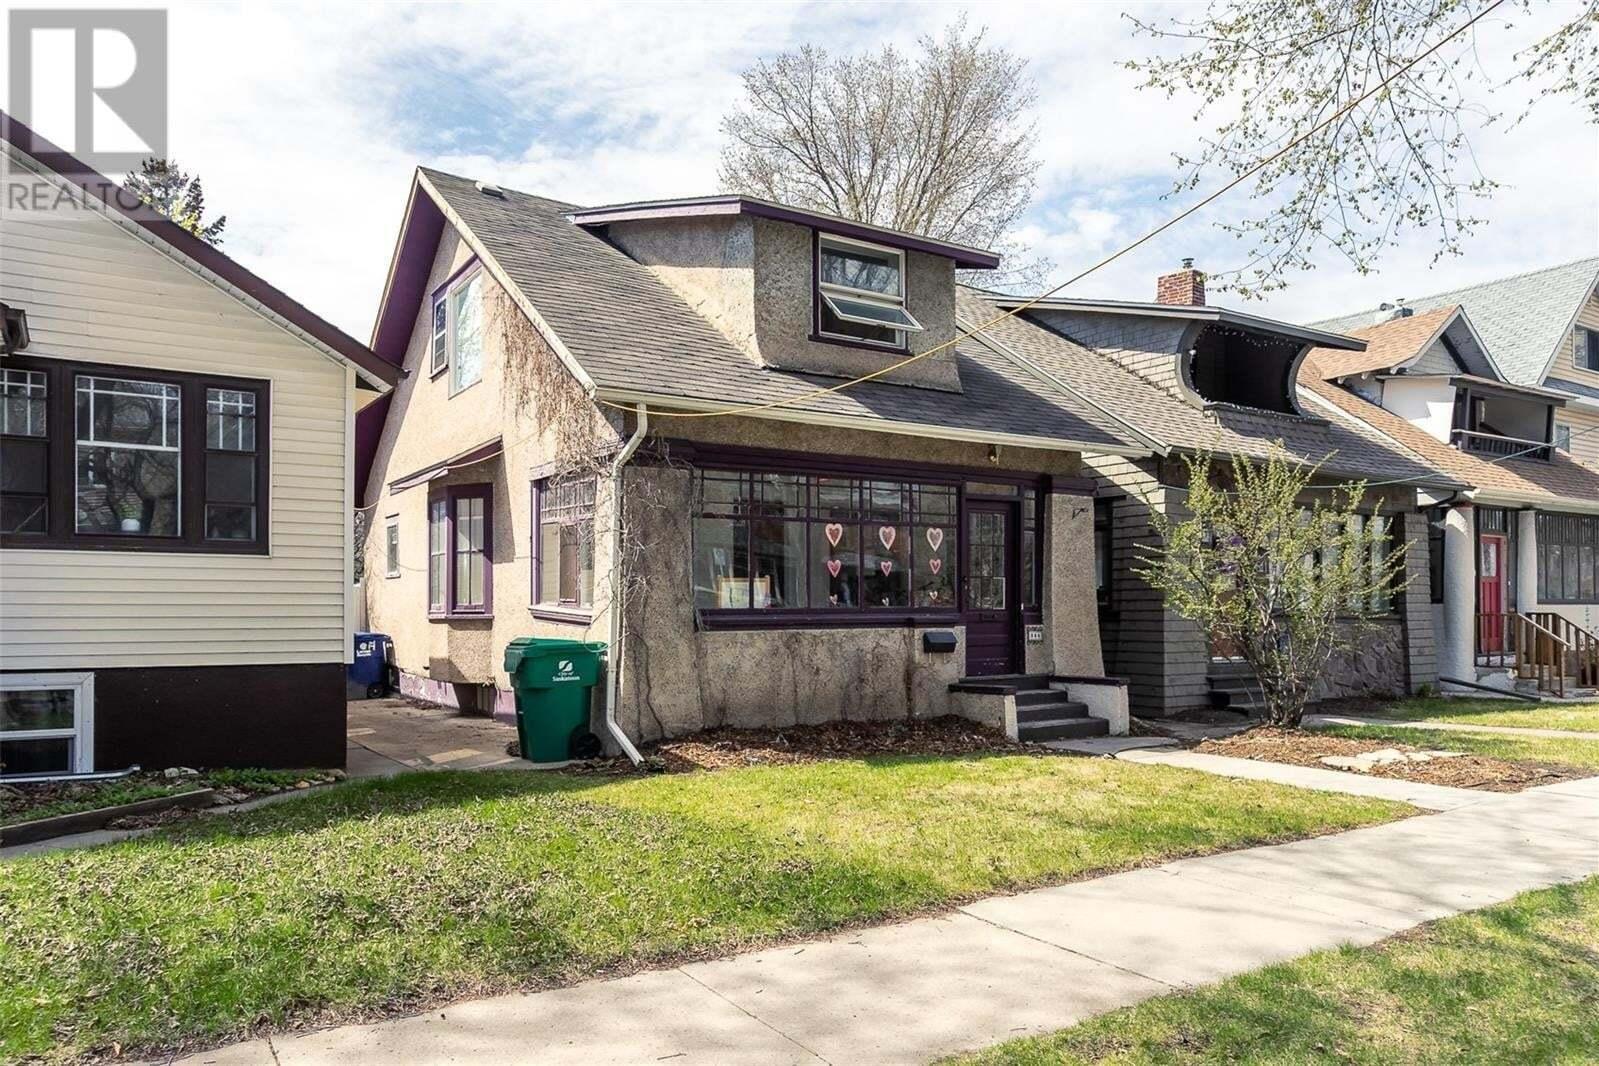 House for sale at 809 6th Ave N Saskatoon Saskatchewan - MLS: SK808939